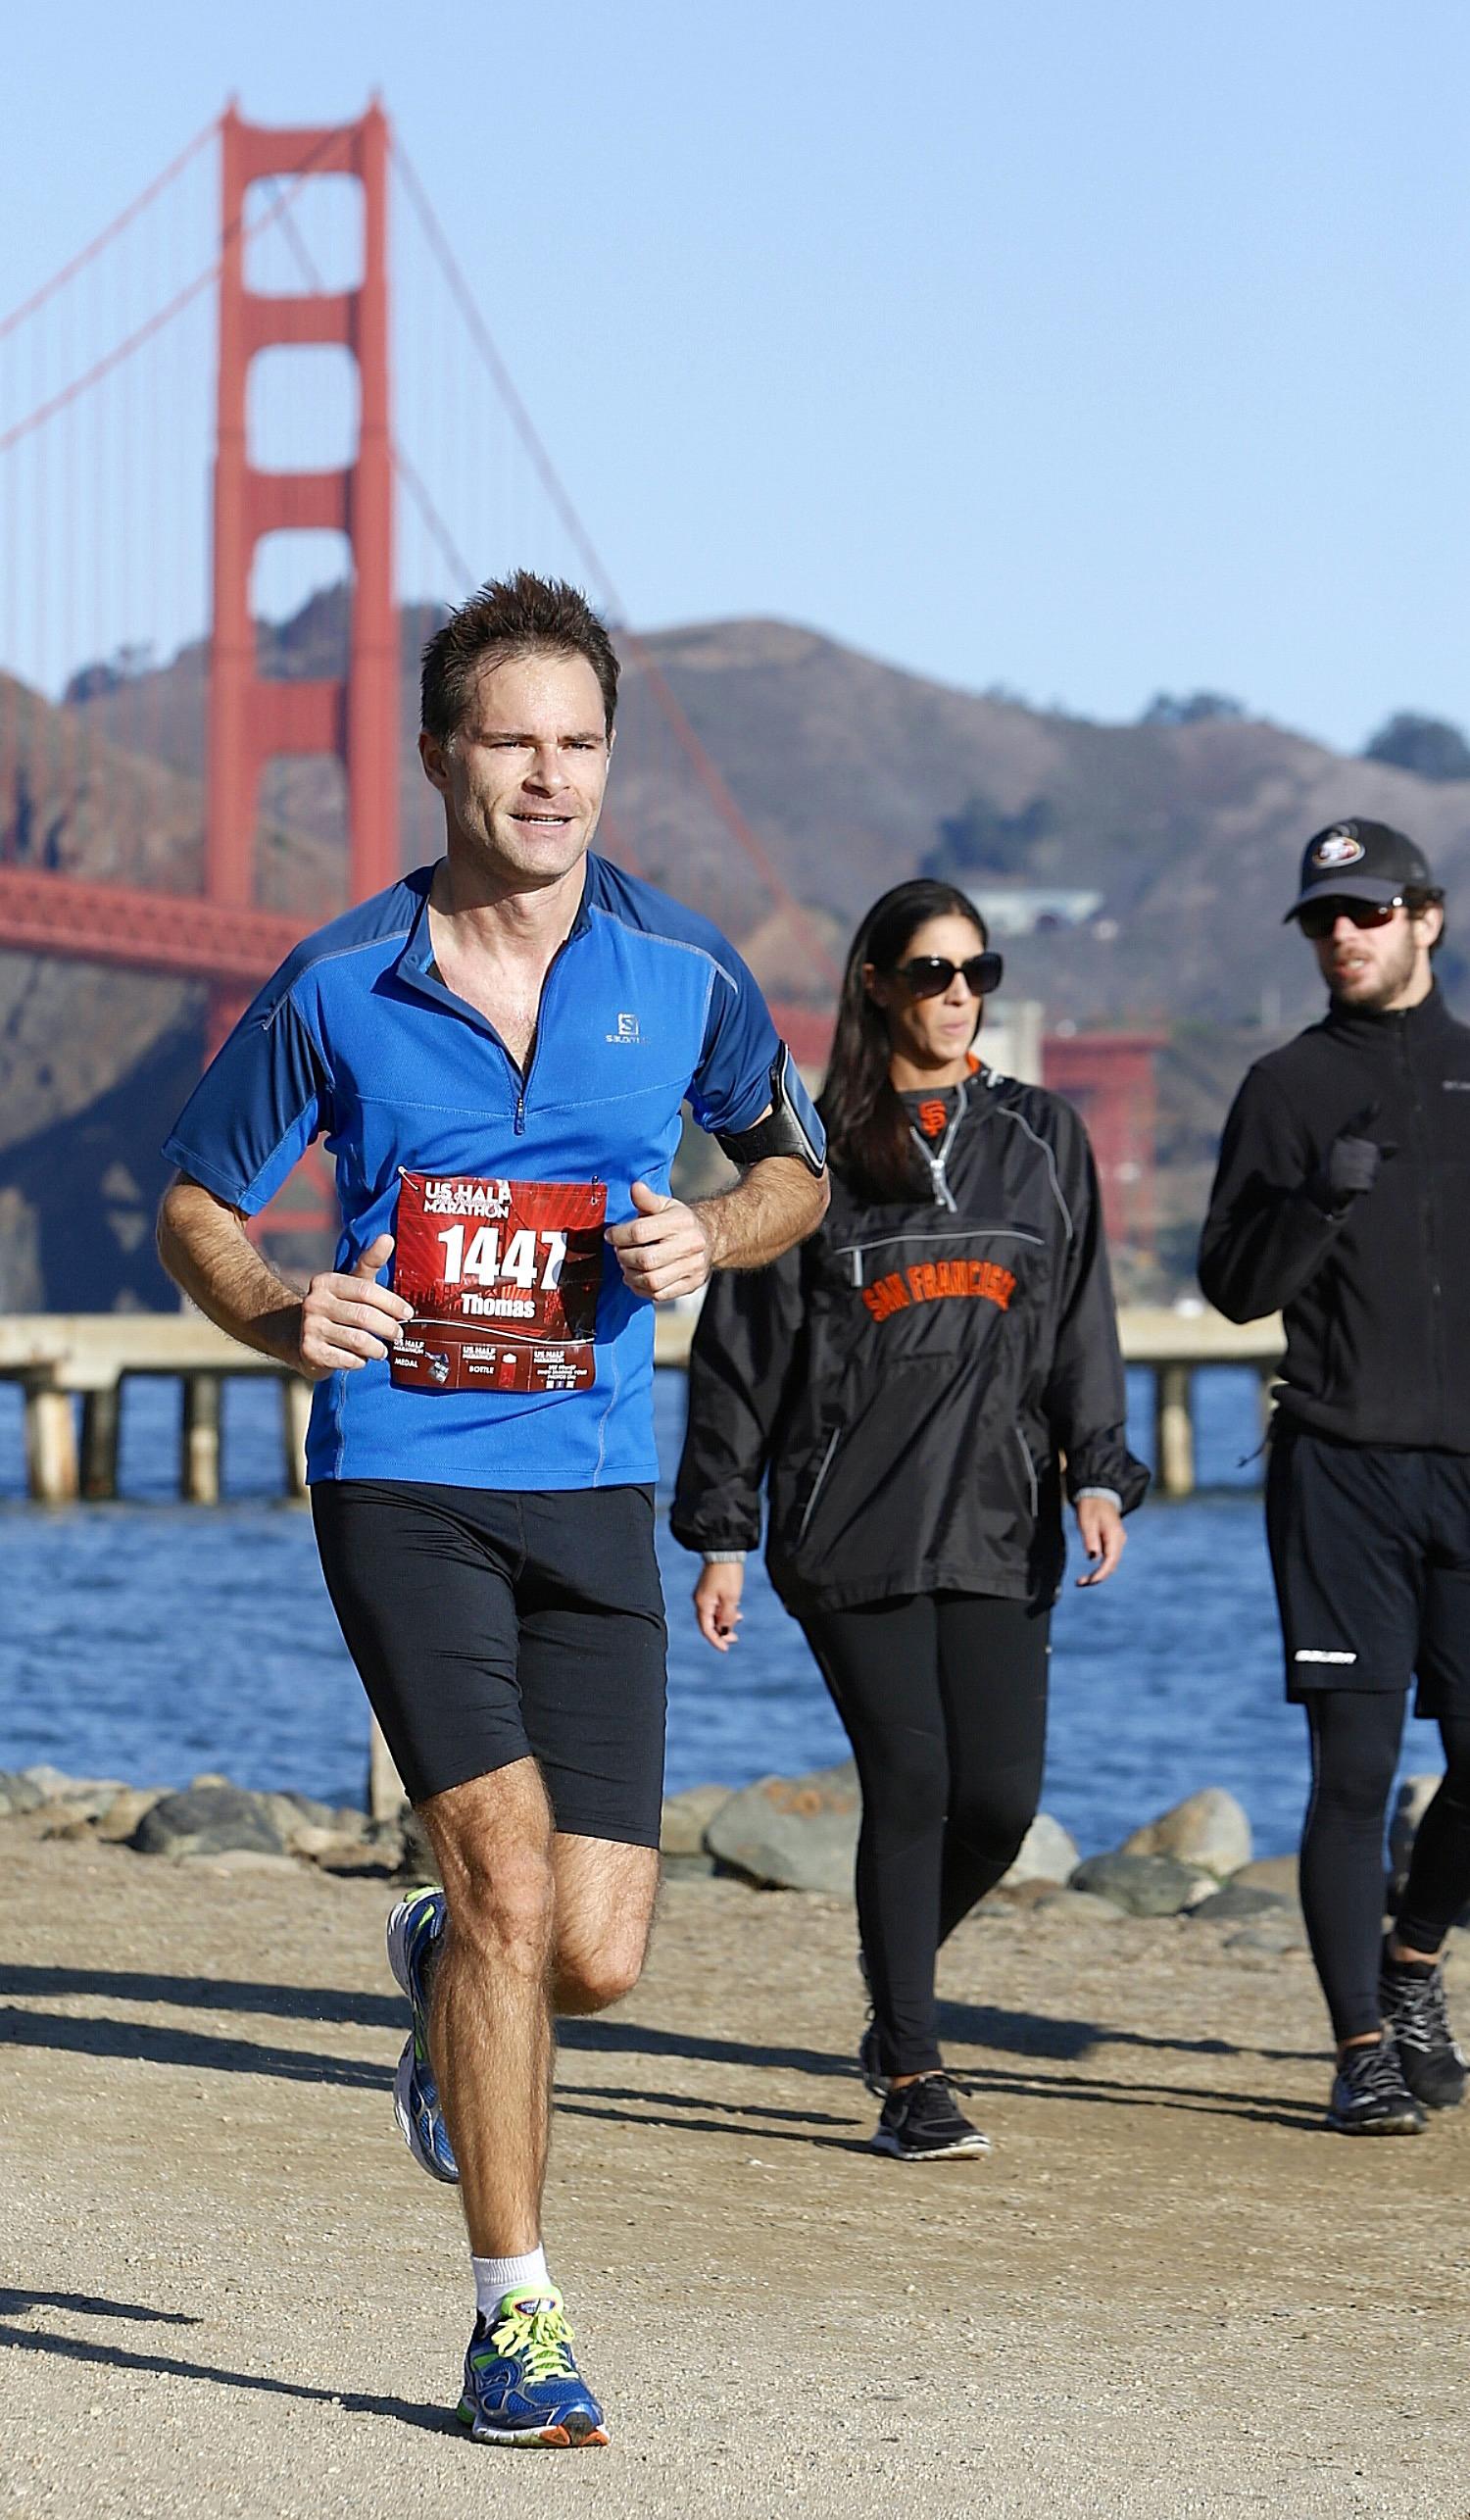 Thomas Sommeregger – US Half Marathon 2014